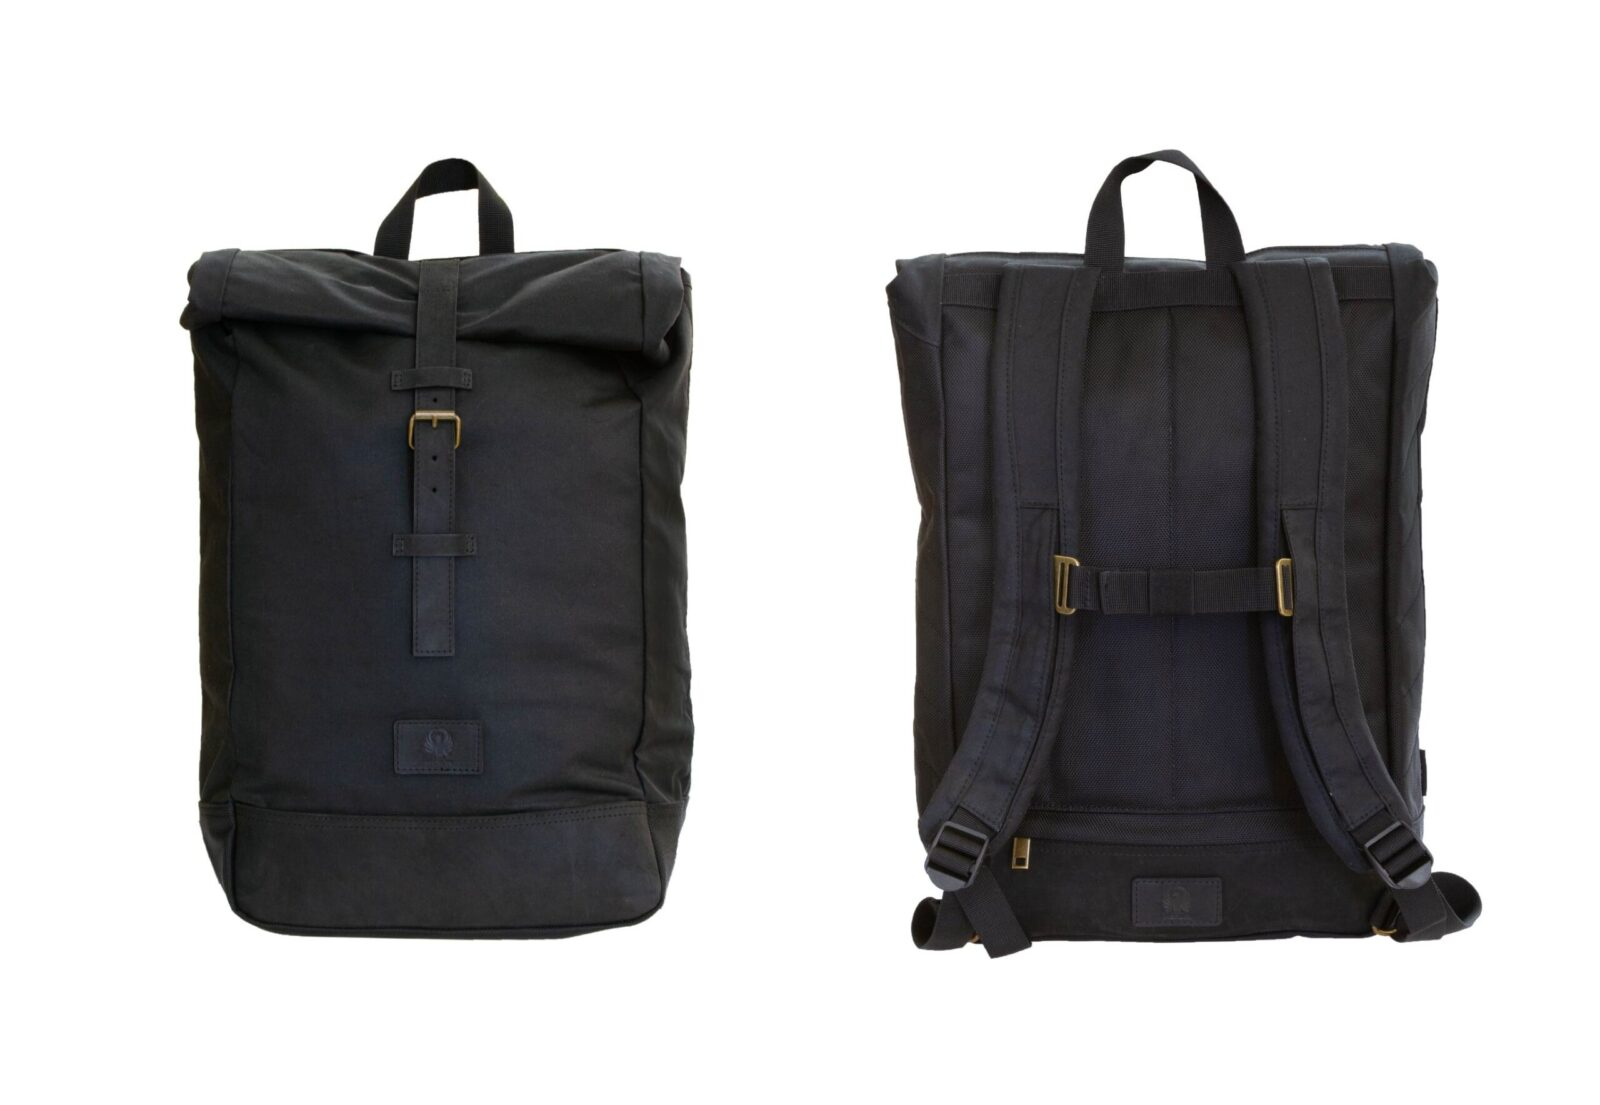 Yarnfield Roll Top Bag by Merlin Bag